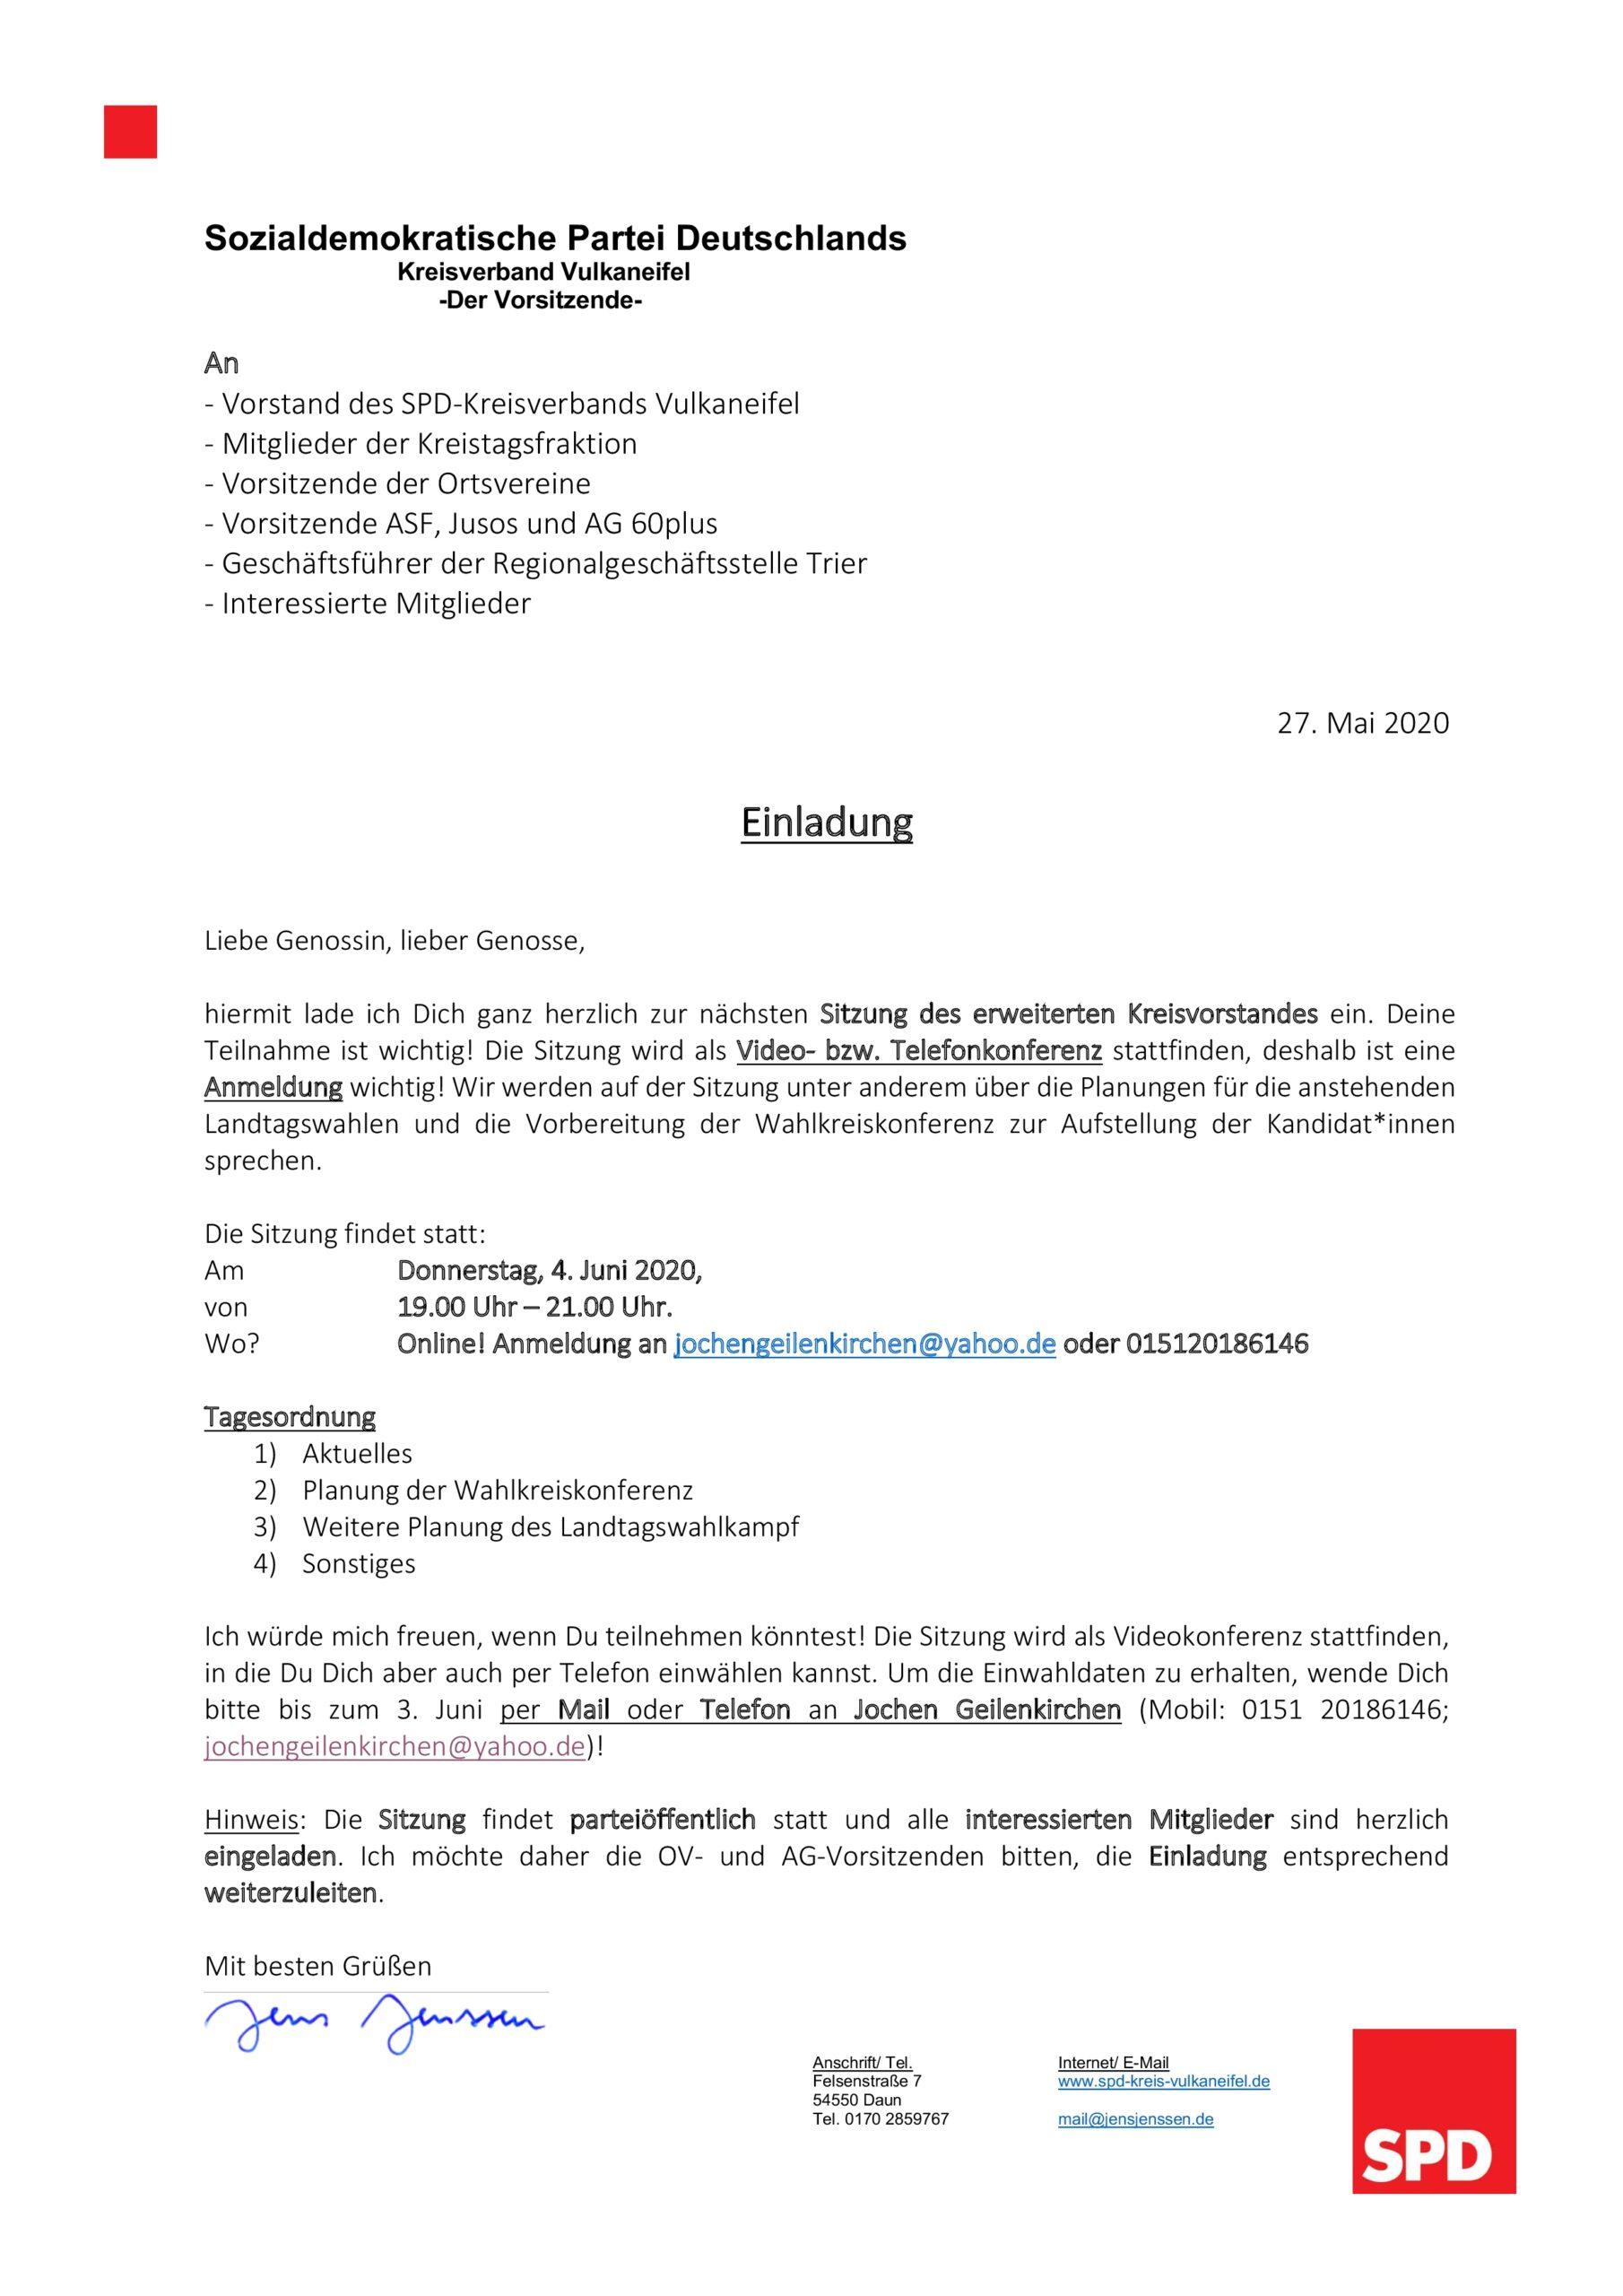 Einladung-KV-04.06.2020